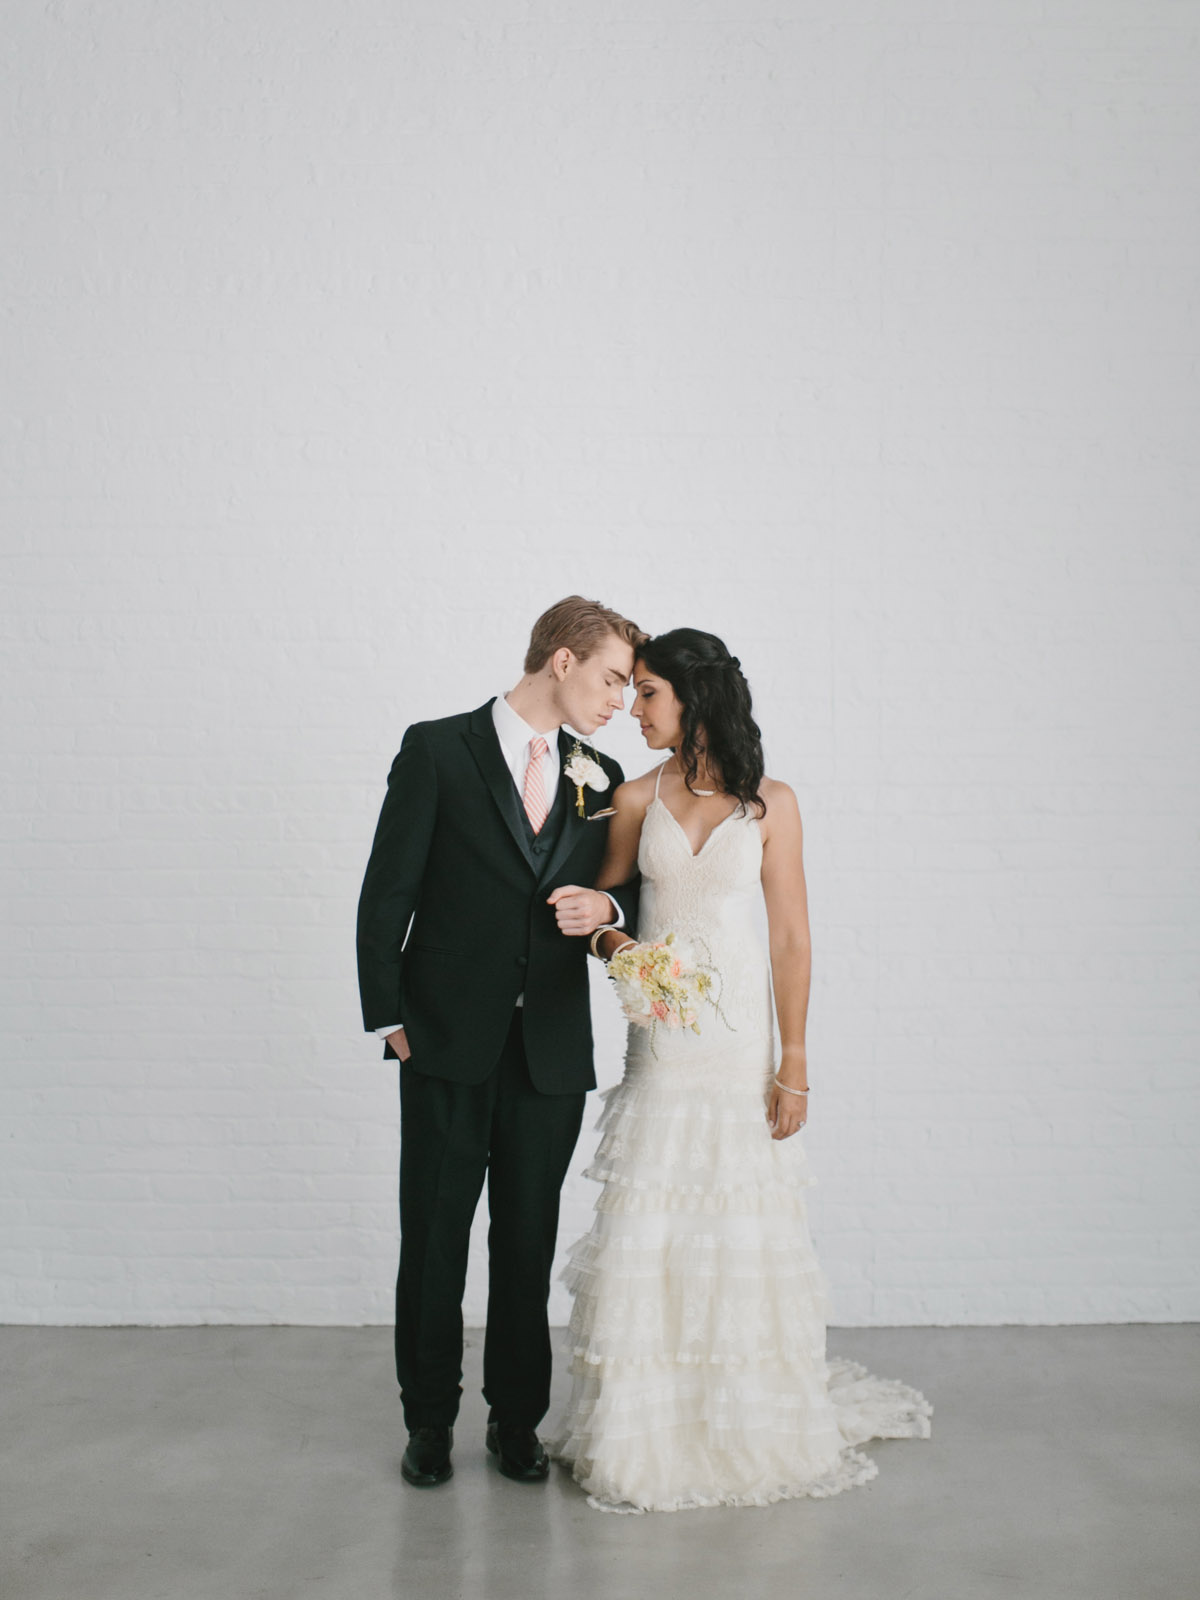 Chez Chicago Wedding Photography-018.jpg